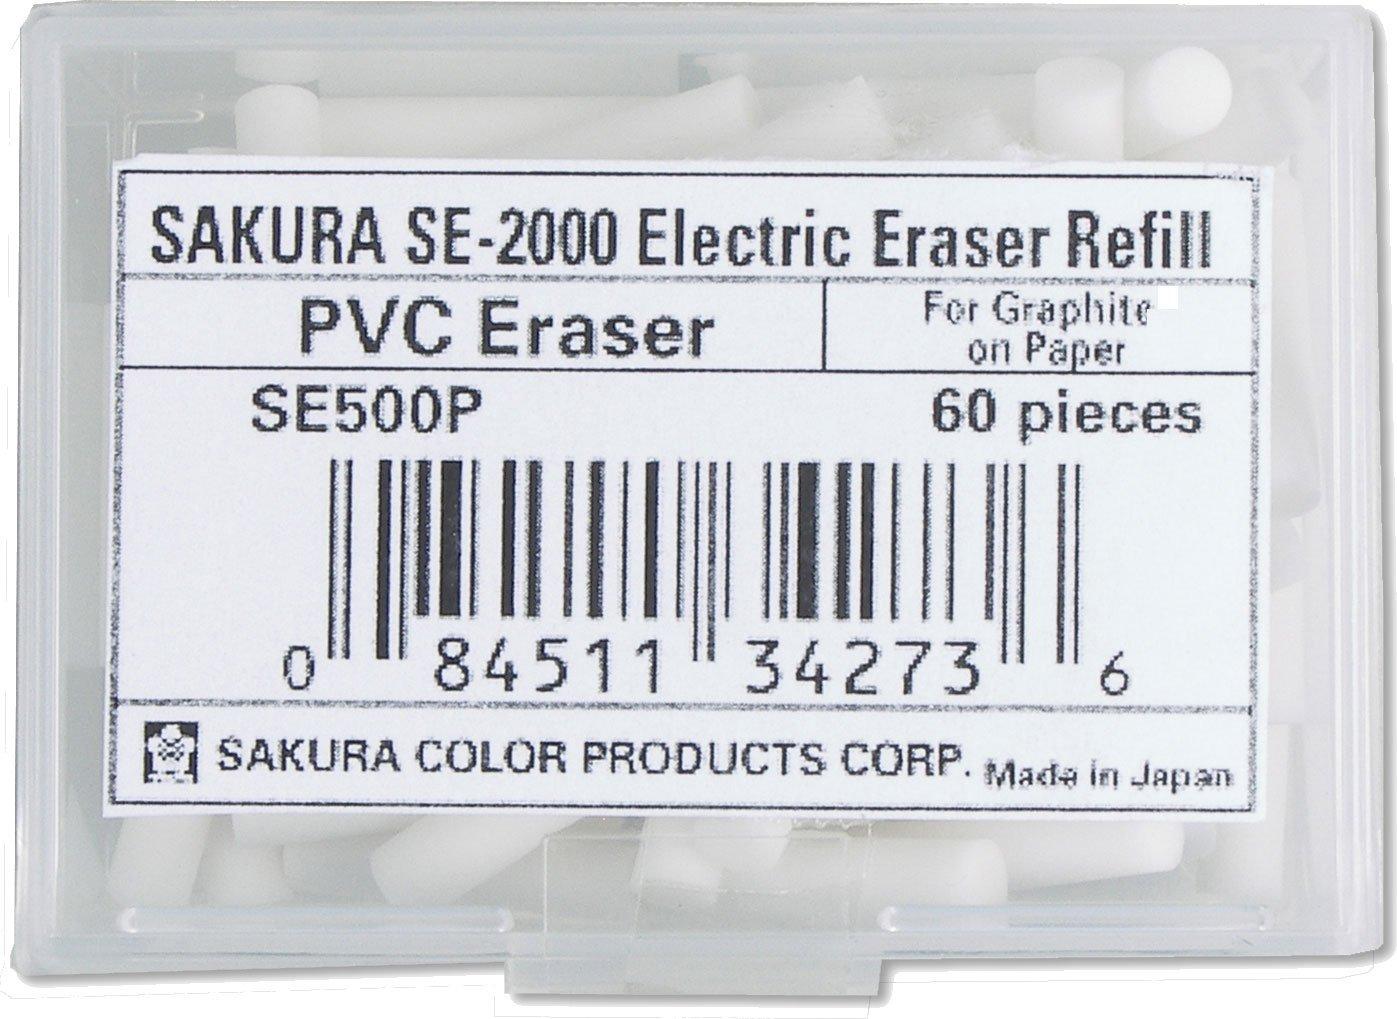 Sakura Electric Eraser Refill 60/Pk, White Sakura of America SE500P